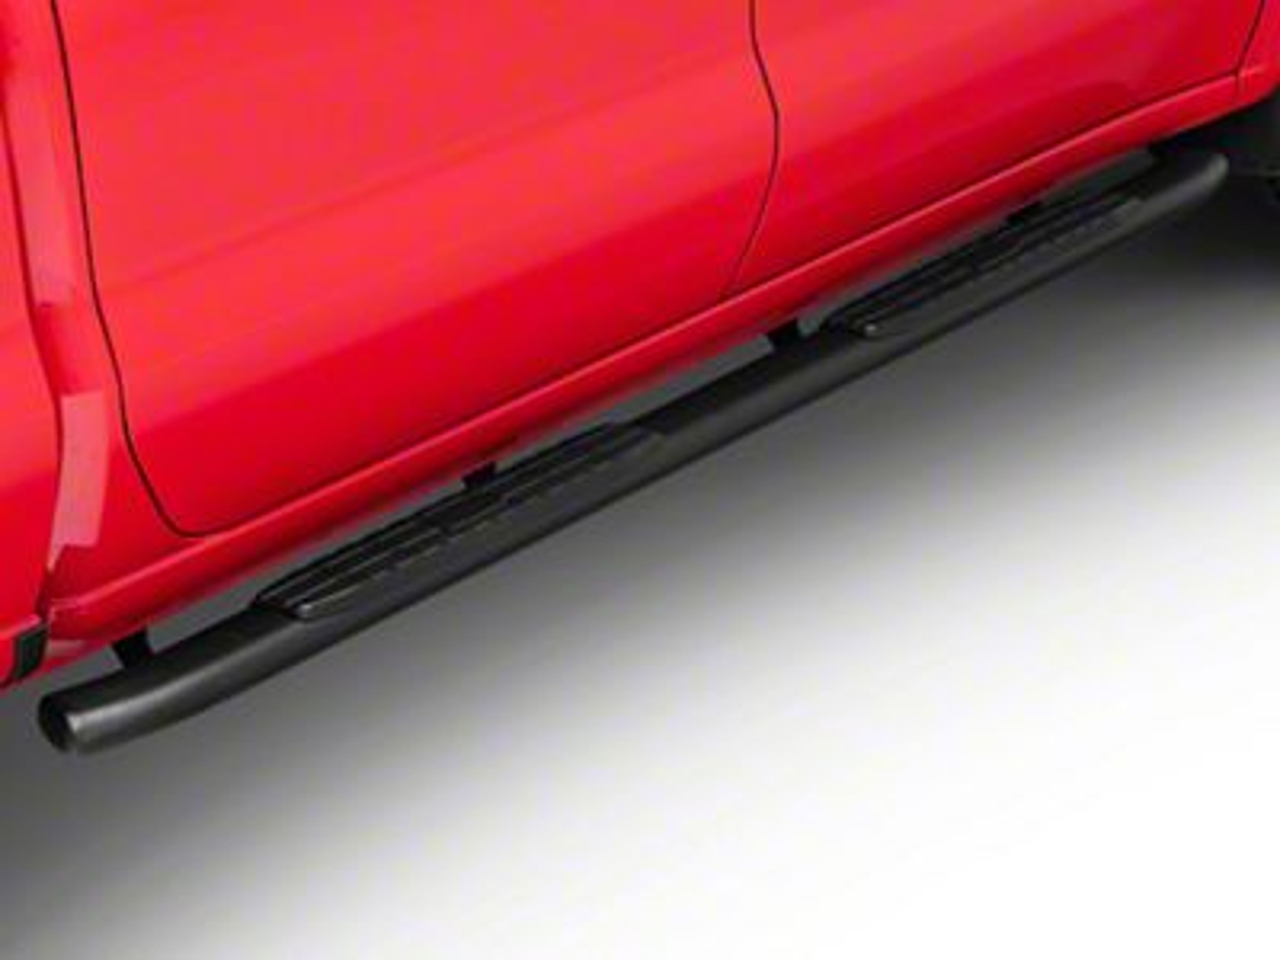 Duratrek PNC Side Step Bars - Textured Black (2019 Silverado 1500 Crew Cab)